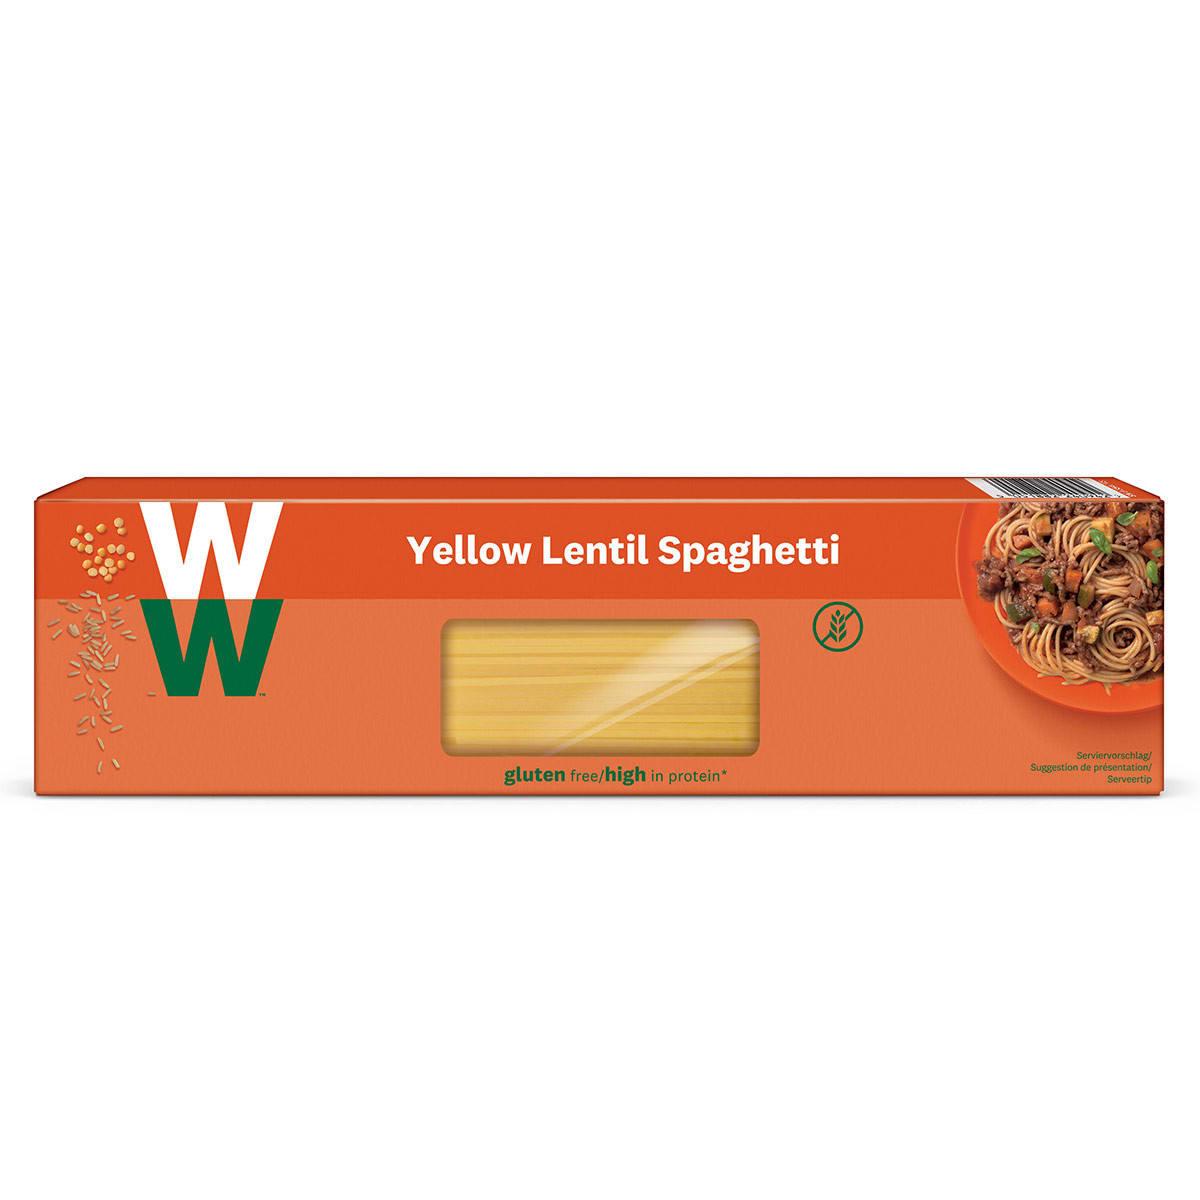 Yellow Lentil Spaghetti Front